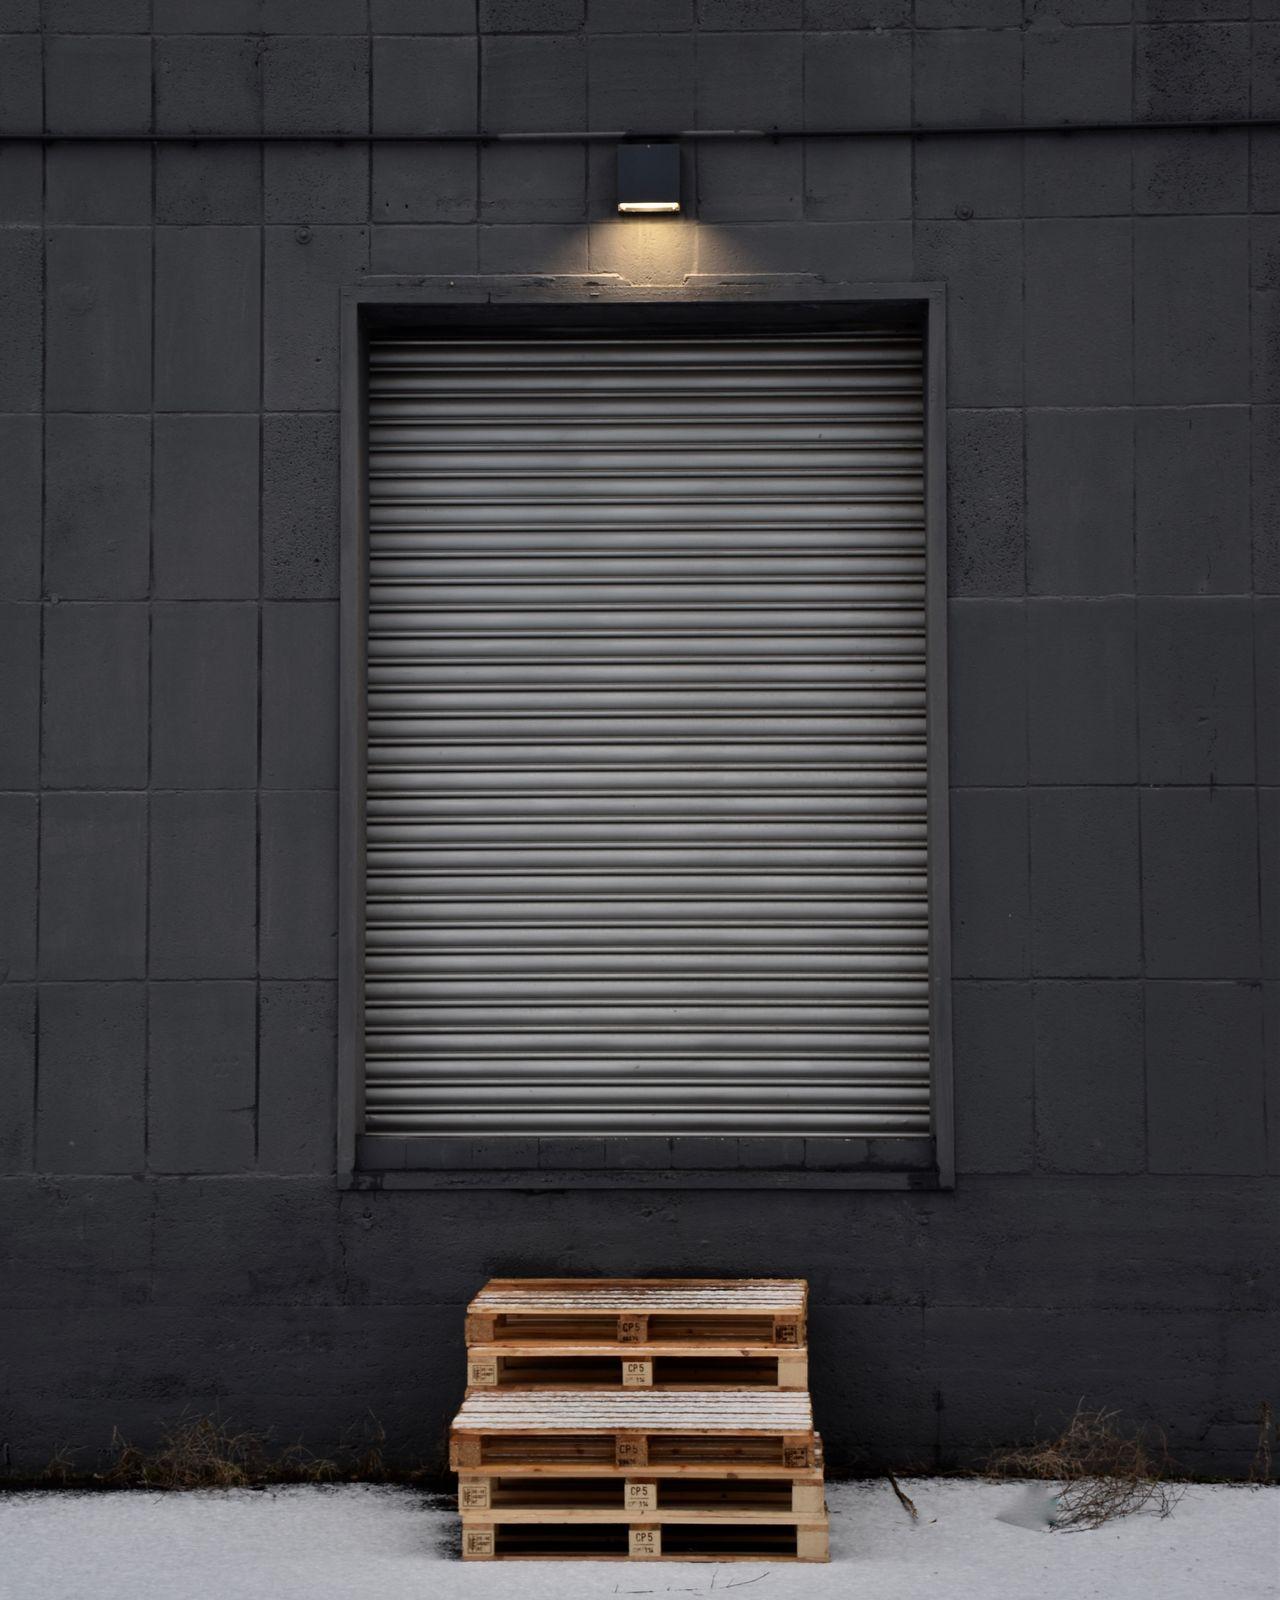 Exterior of closed shop